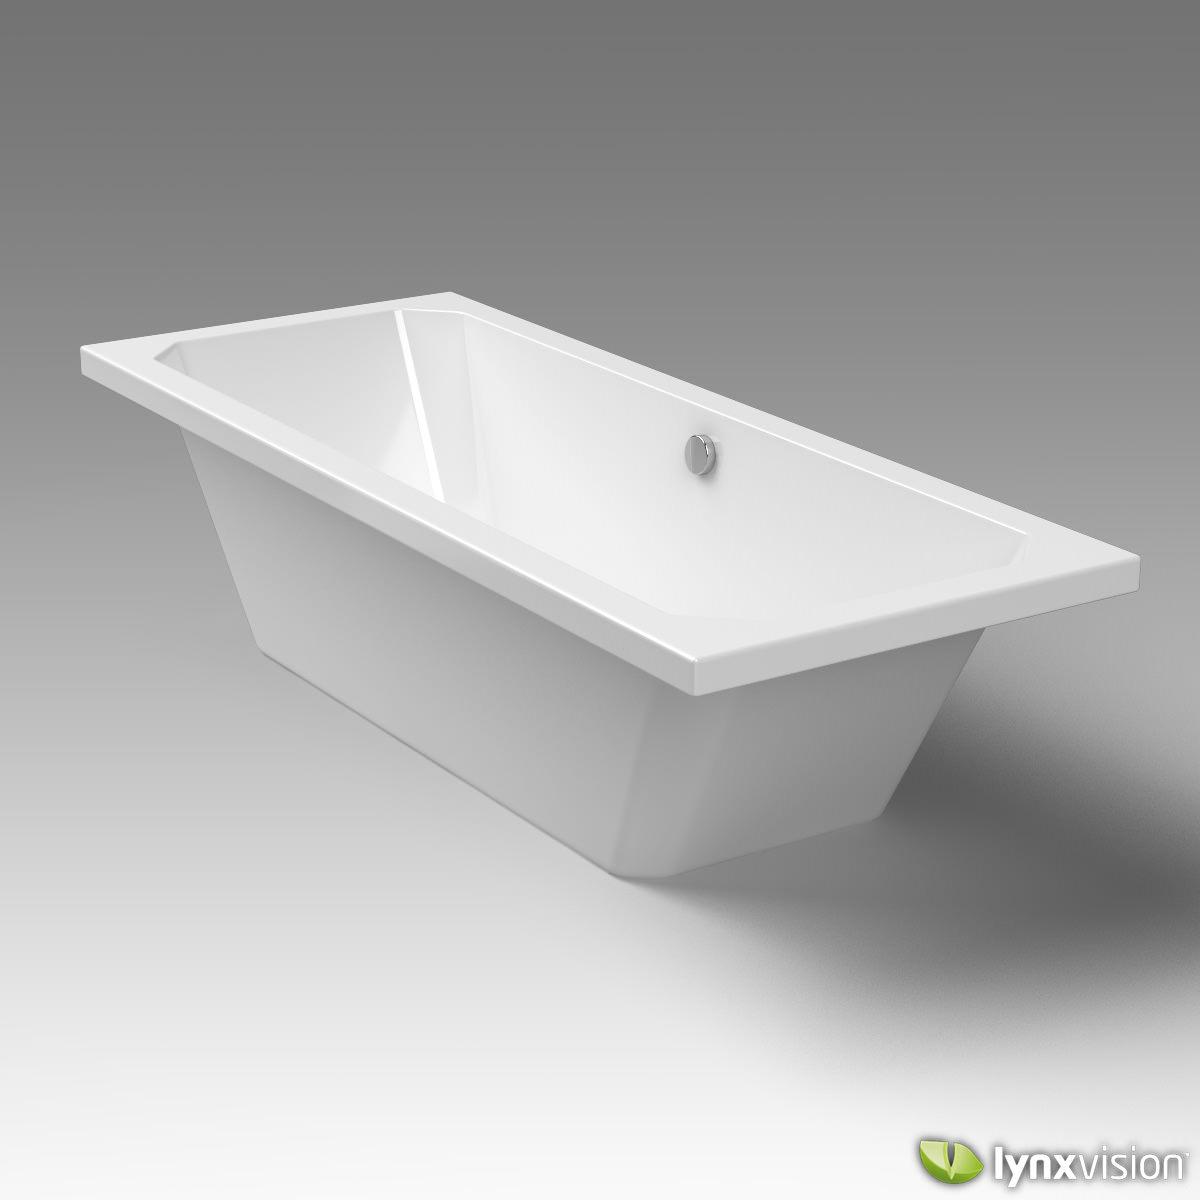 duravit bathtub 1930 series 3d model max obj fbx c4d. Black Bedroom Furniture Sets. Home Design Ideas